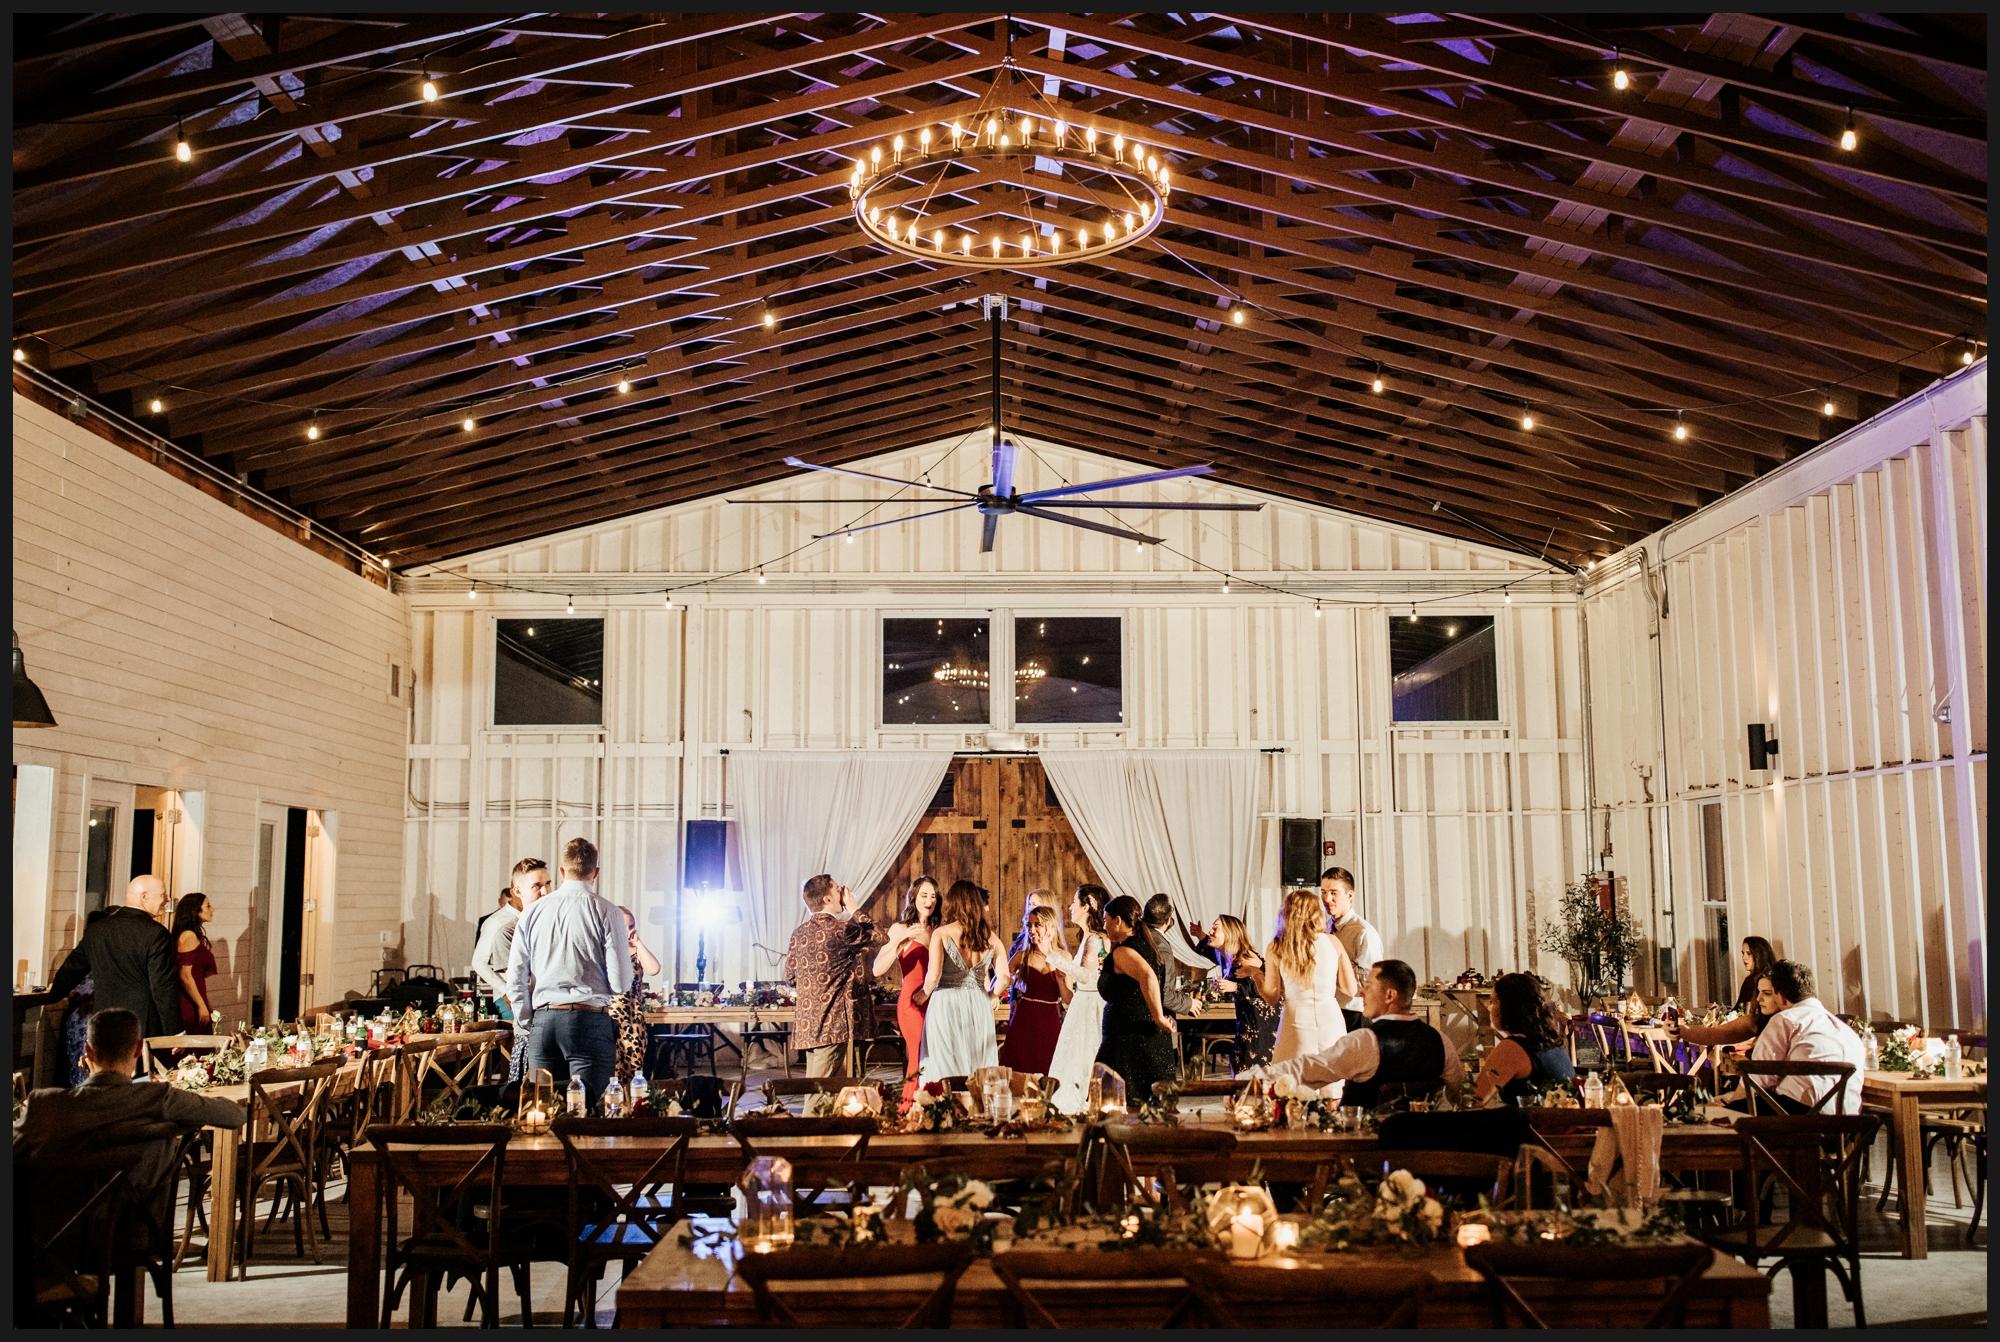 Orlando-Wedding-Photographer-destination-wedding-photographer-florida-wedding-photographer-hawaii-wedding-photographer_0547.jpg